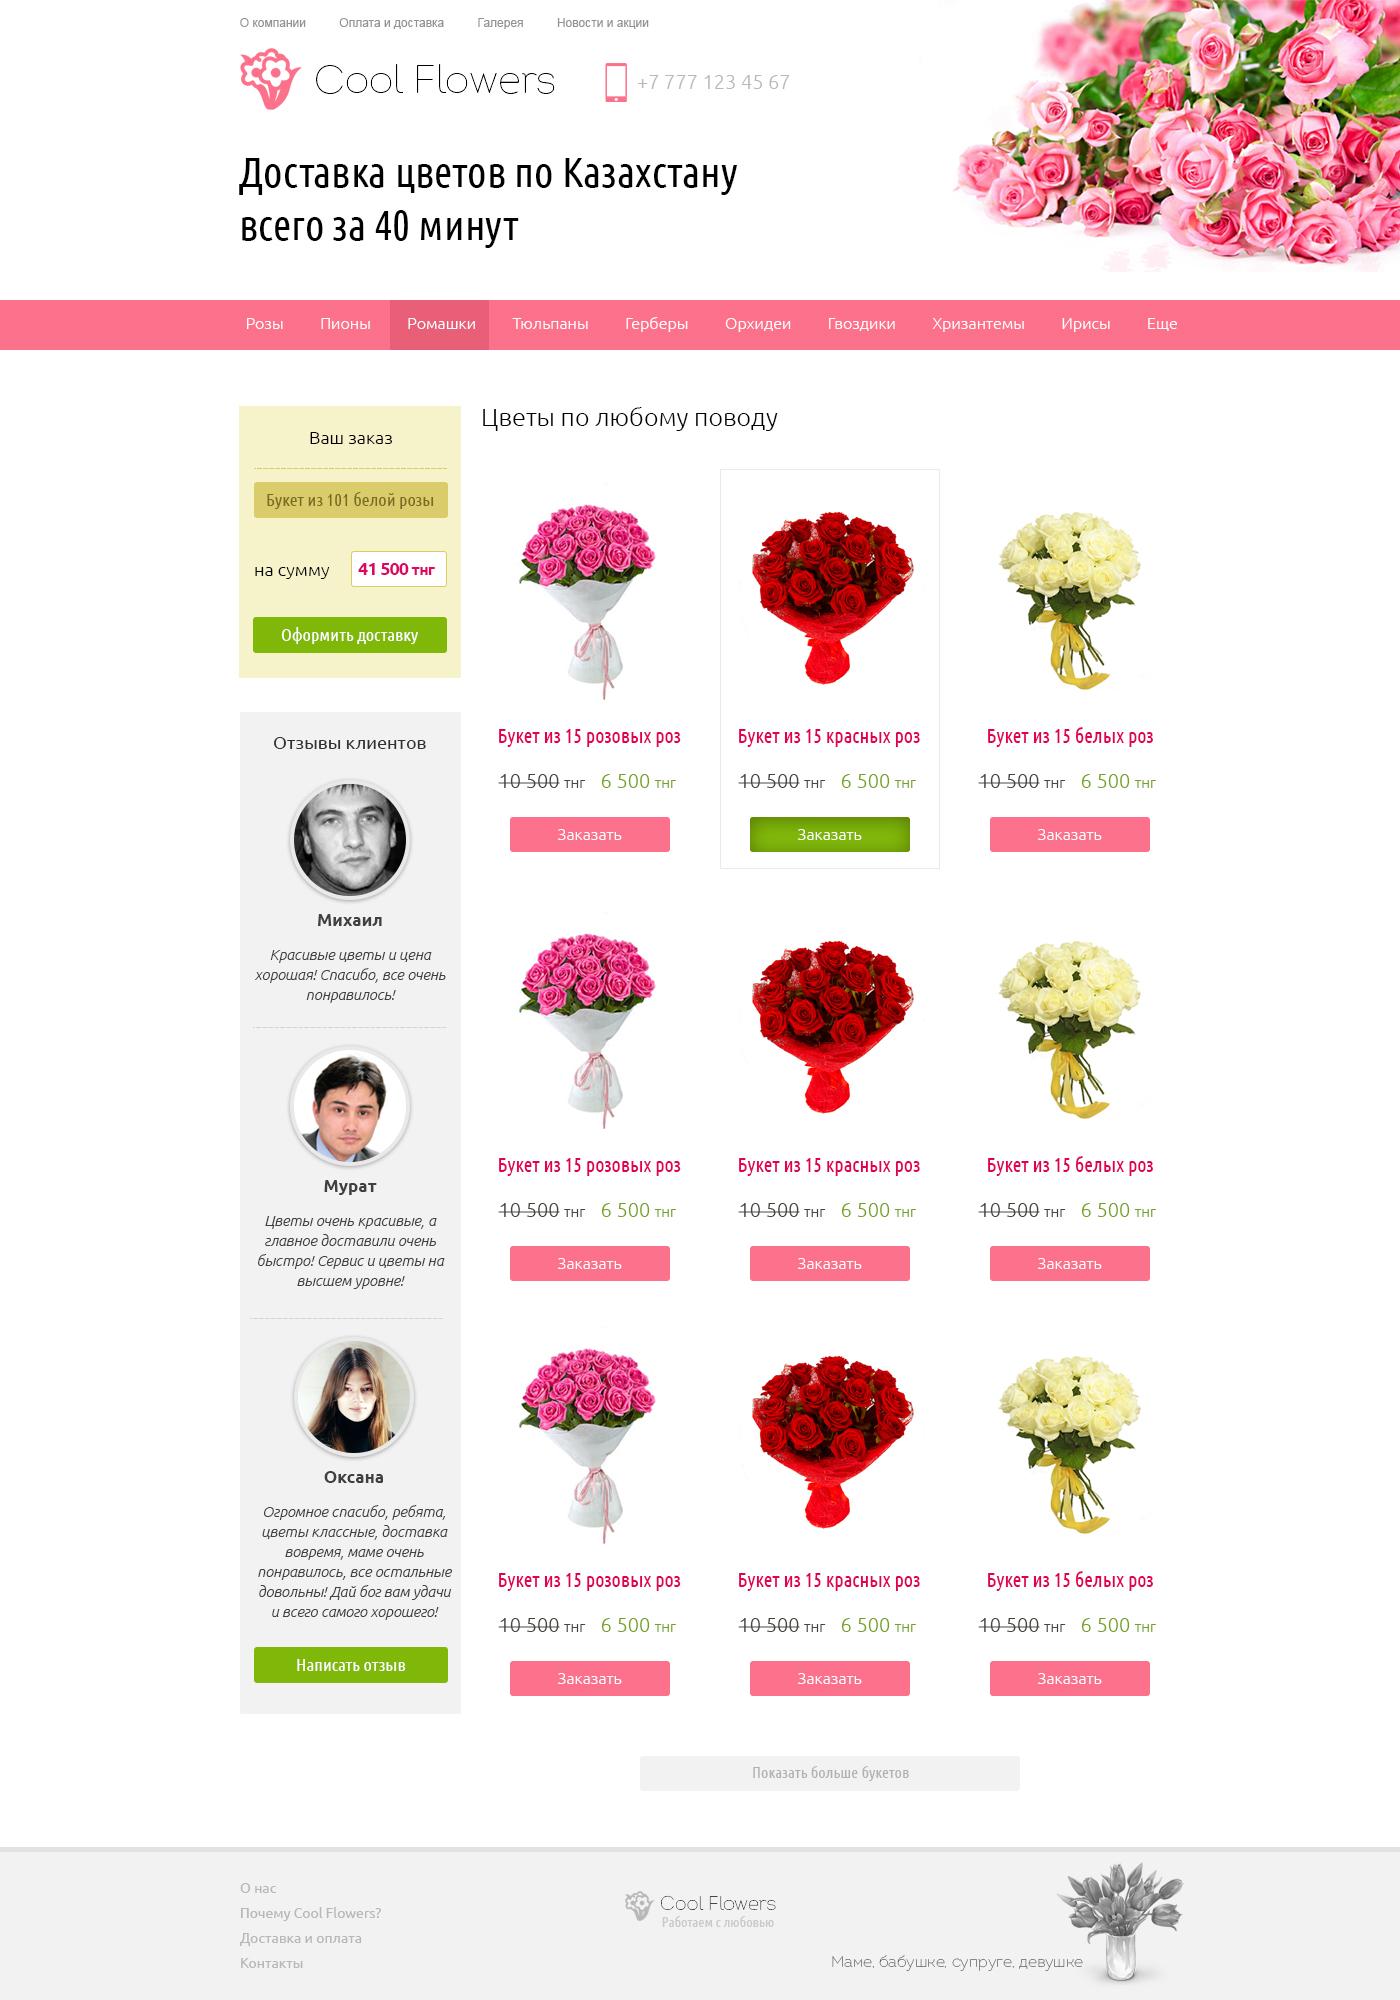 Услуга доставки цветов по казахстану, букеты минске